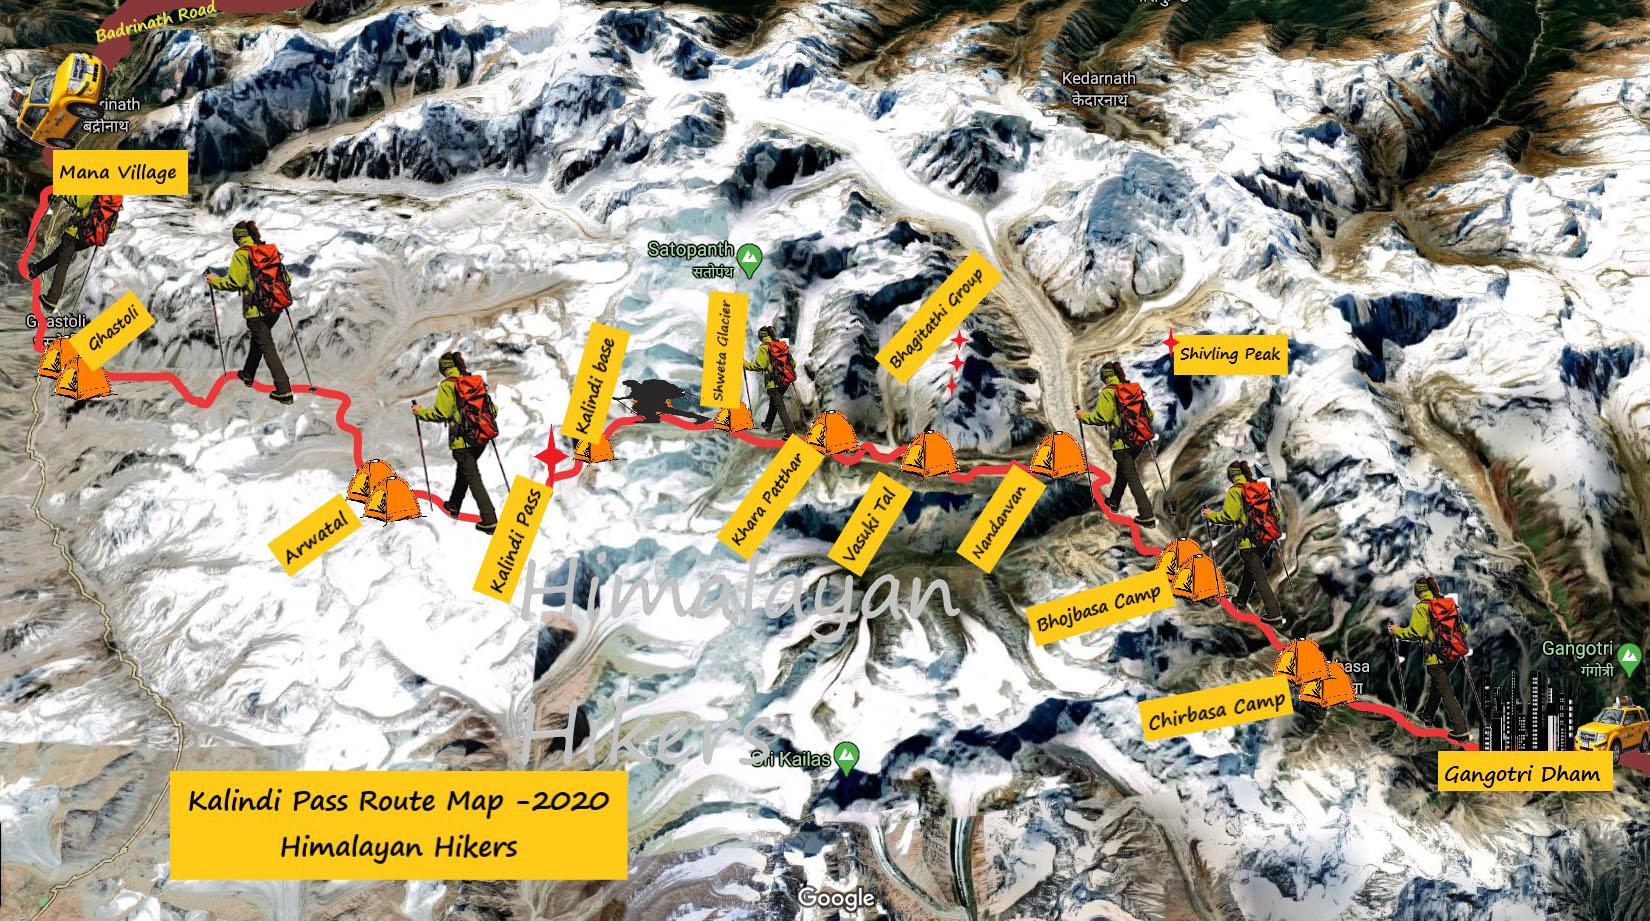 Kalindi Pass Route Map